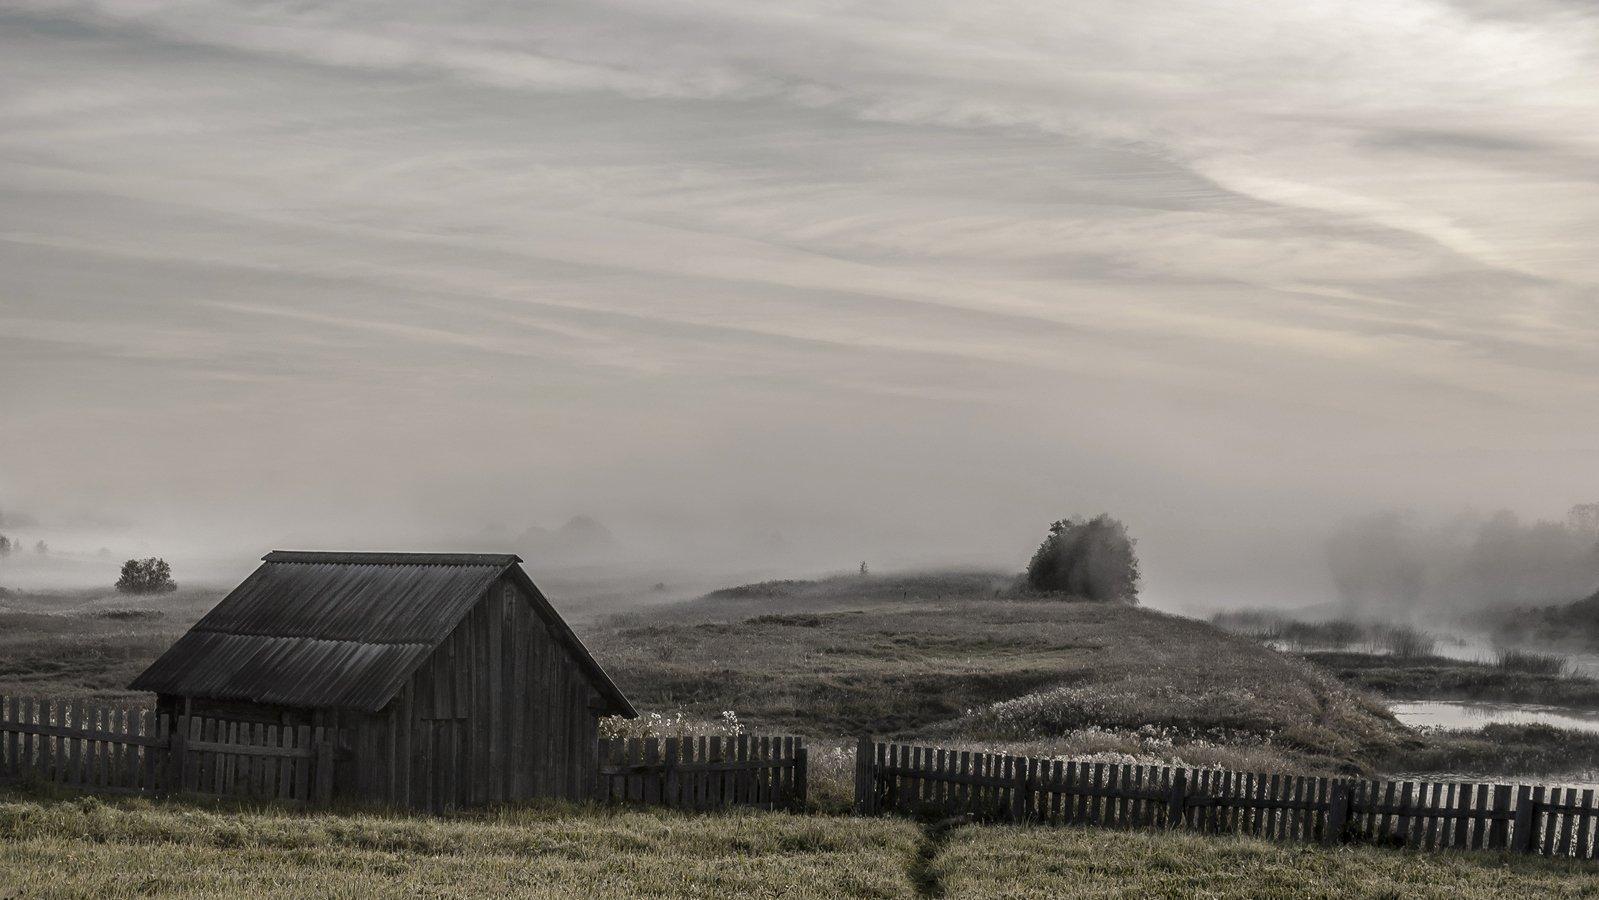 вологодская область, река вожега, деревня коневка,утро, туман, Vershinina Valentina